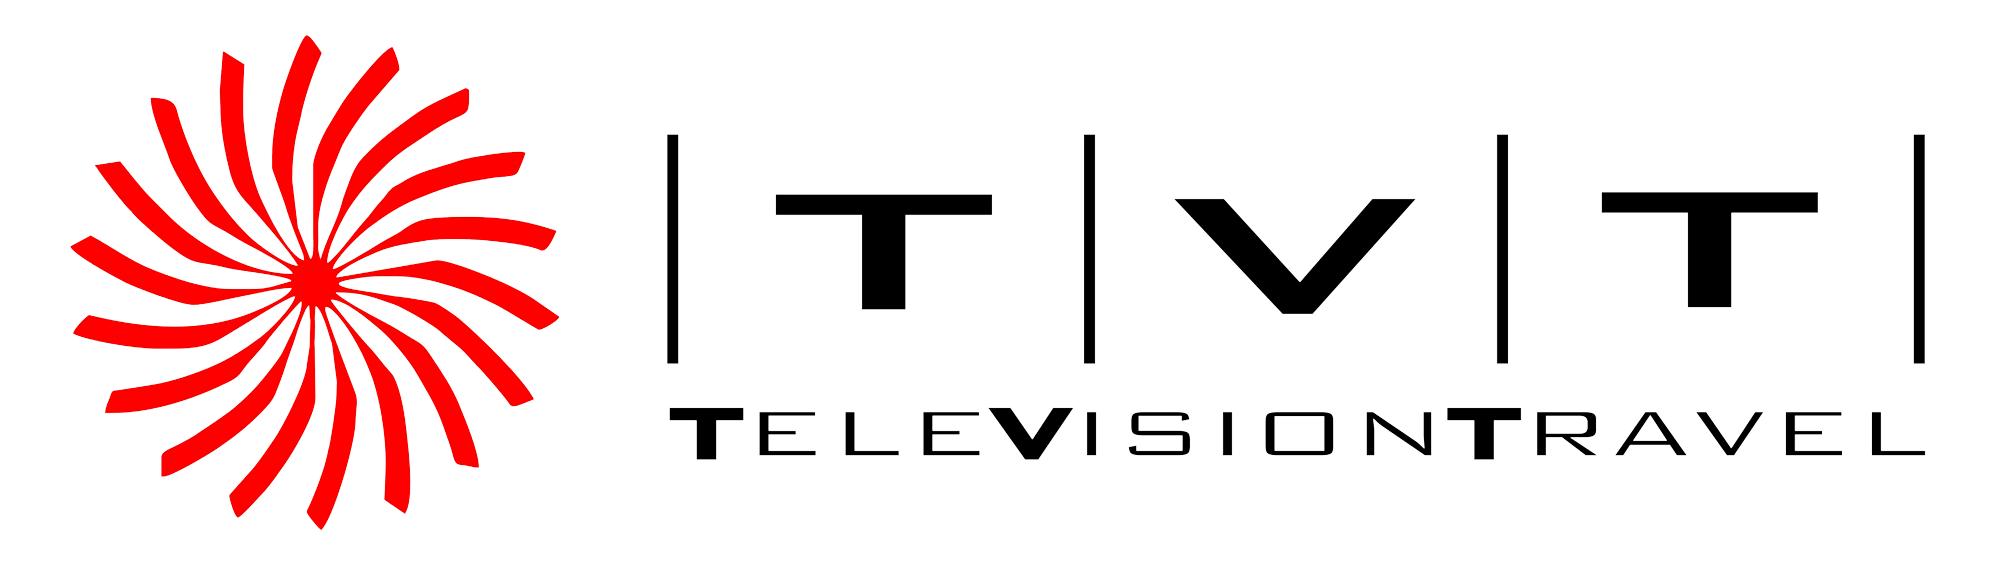 Television Travel